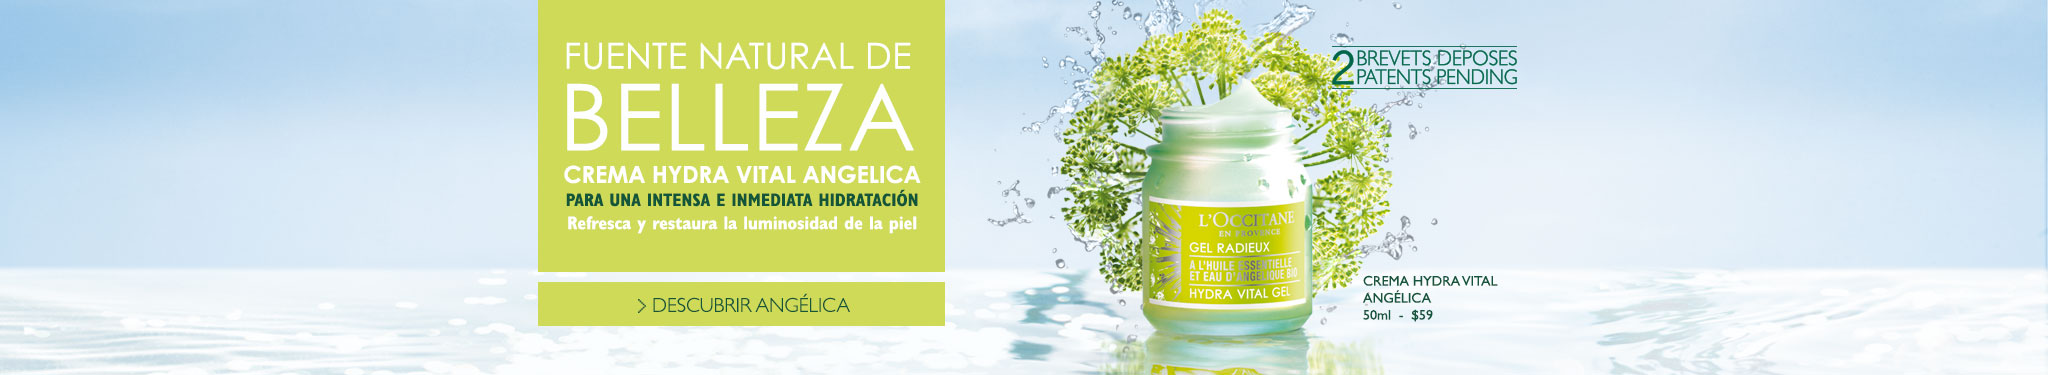 Crema Hydra Vital Angélica, para una intensa e inmediata hidratación